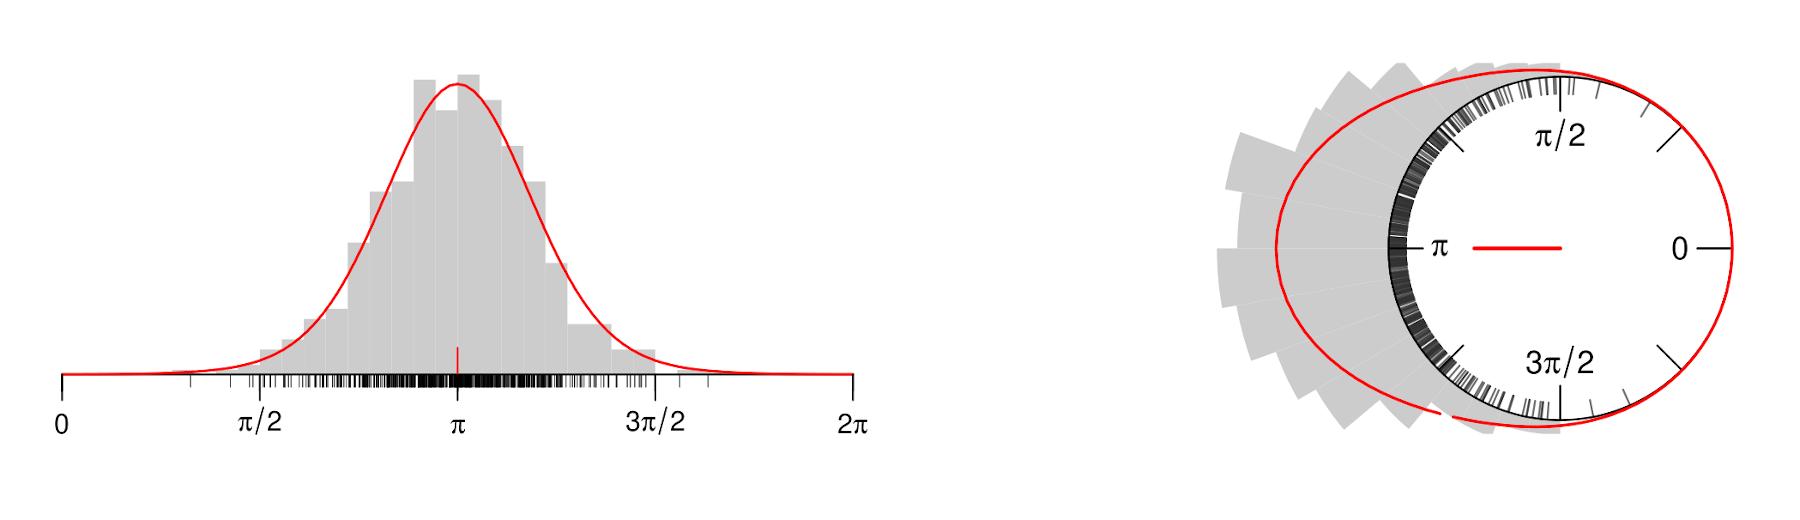 von Mises density